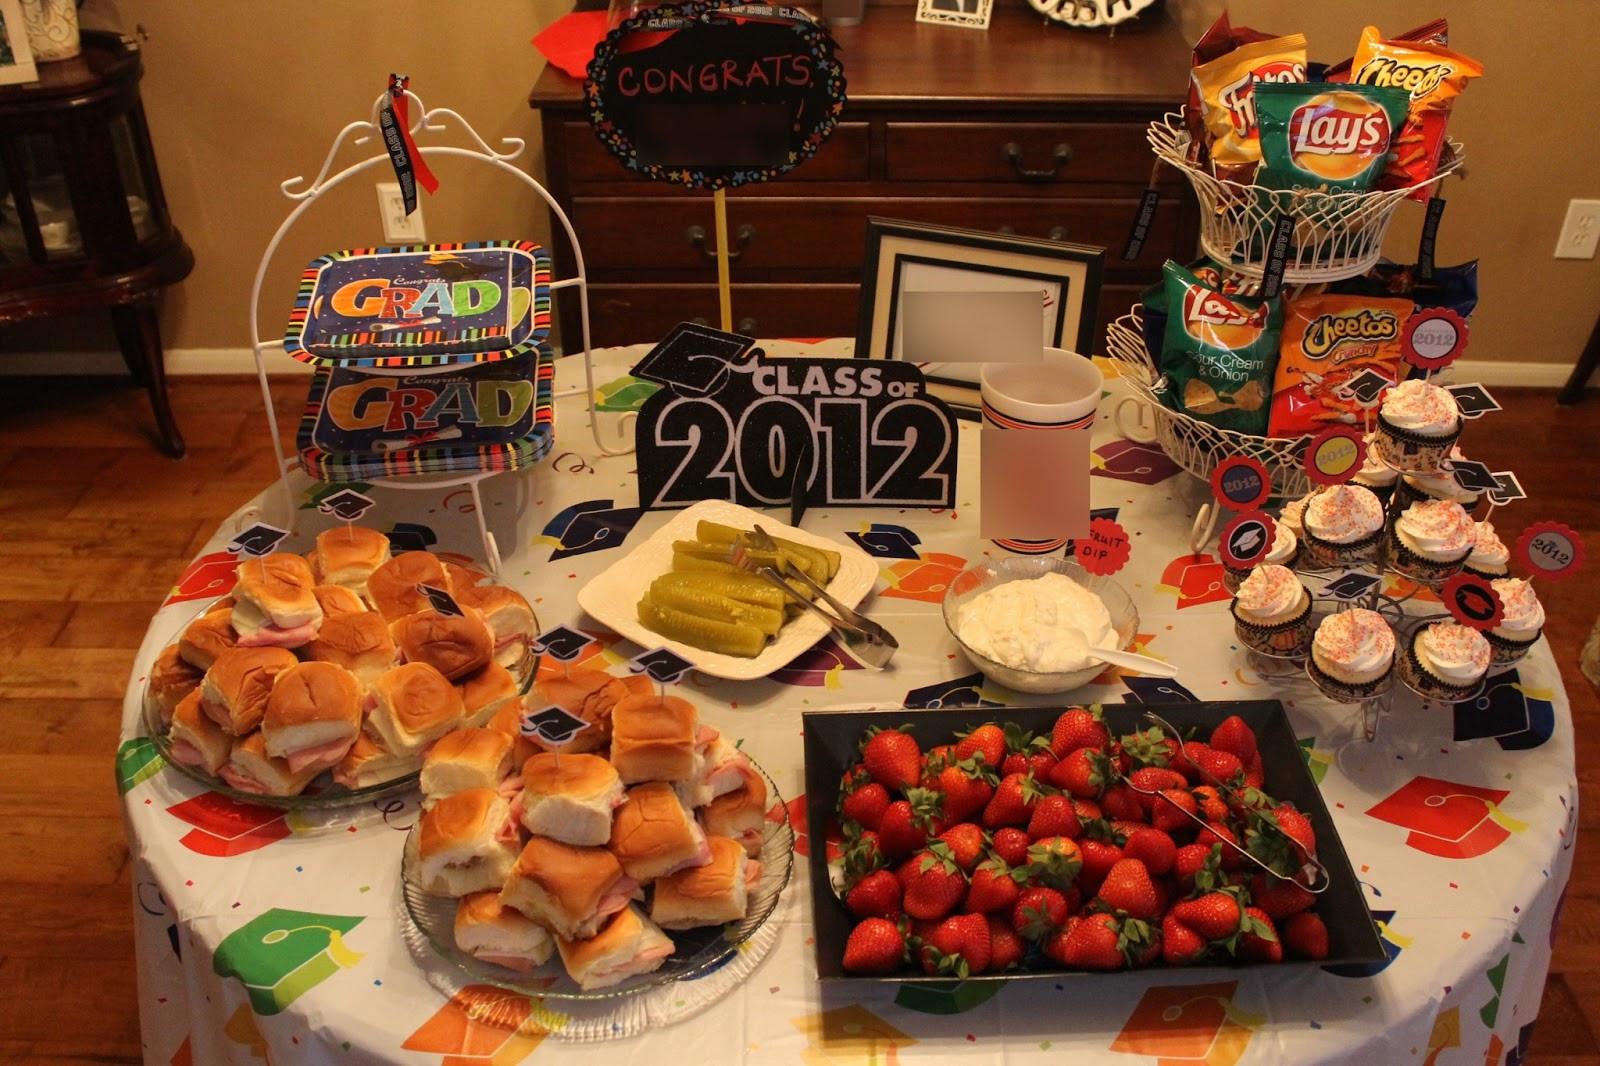 Outdoor Graduation Party Food Ideas  Texas Decor Graduation Party Gift Ideas